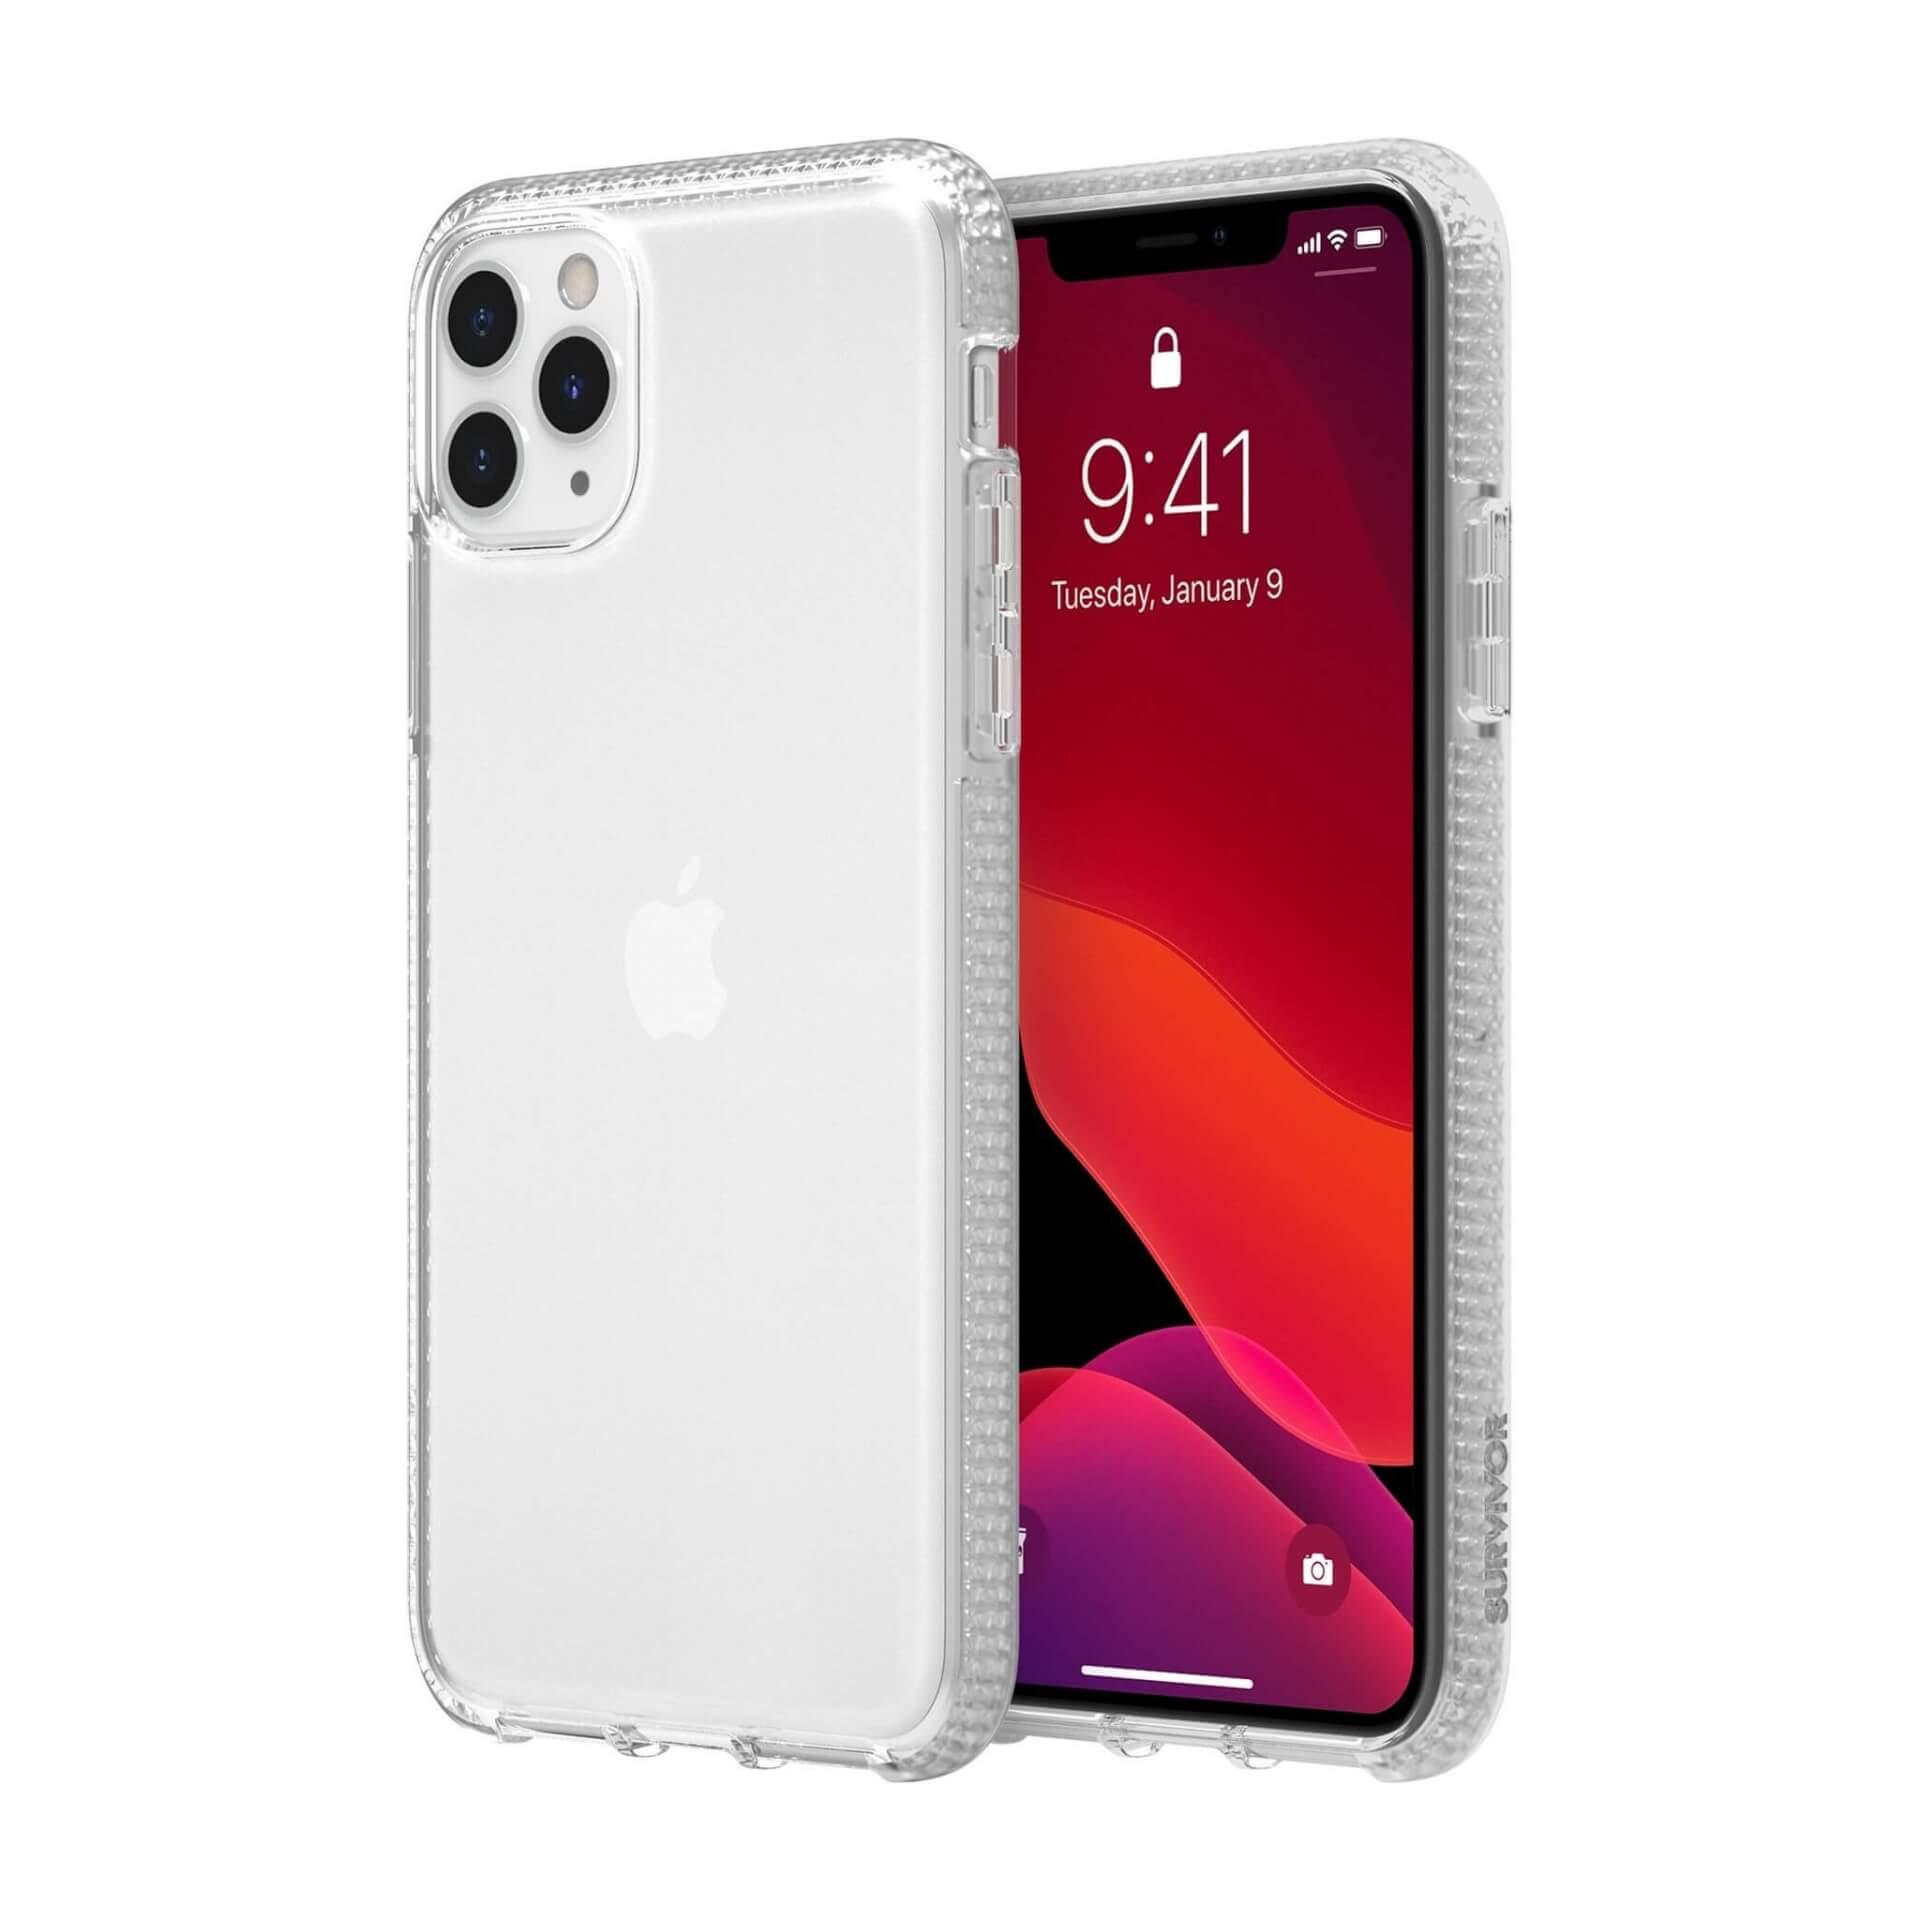 Griffin Survivor Clear Case — хибриден удароустойчив кейс за iPhone 11 Pro Max (прозрачен) - 3